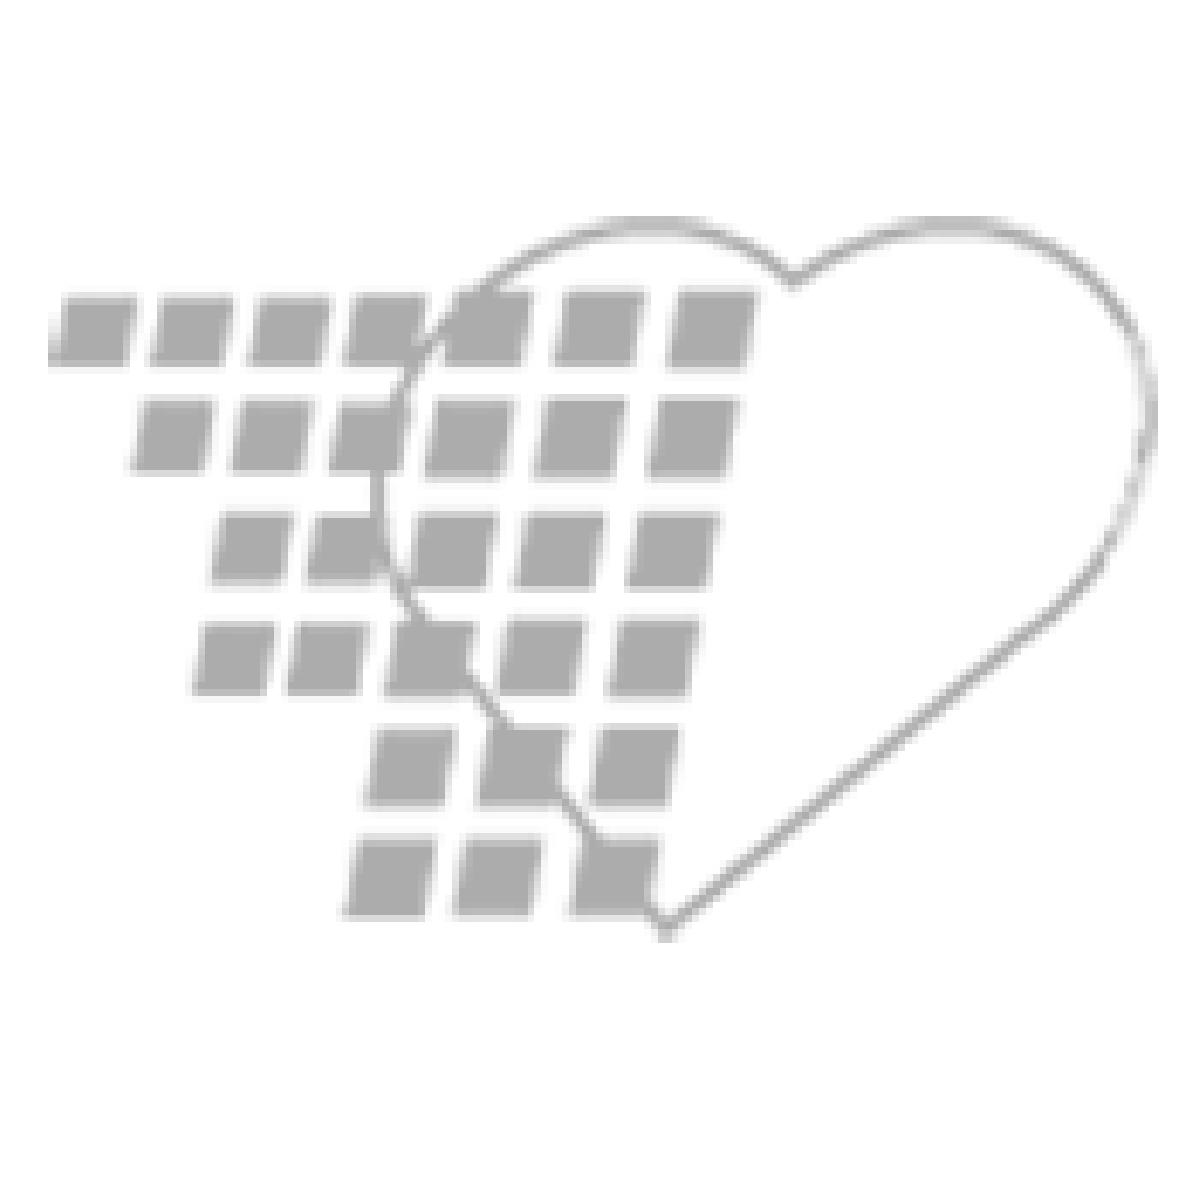 04-71-1007 - Training Mobile Horizontal Headwall Sapphire Series